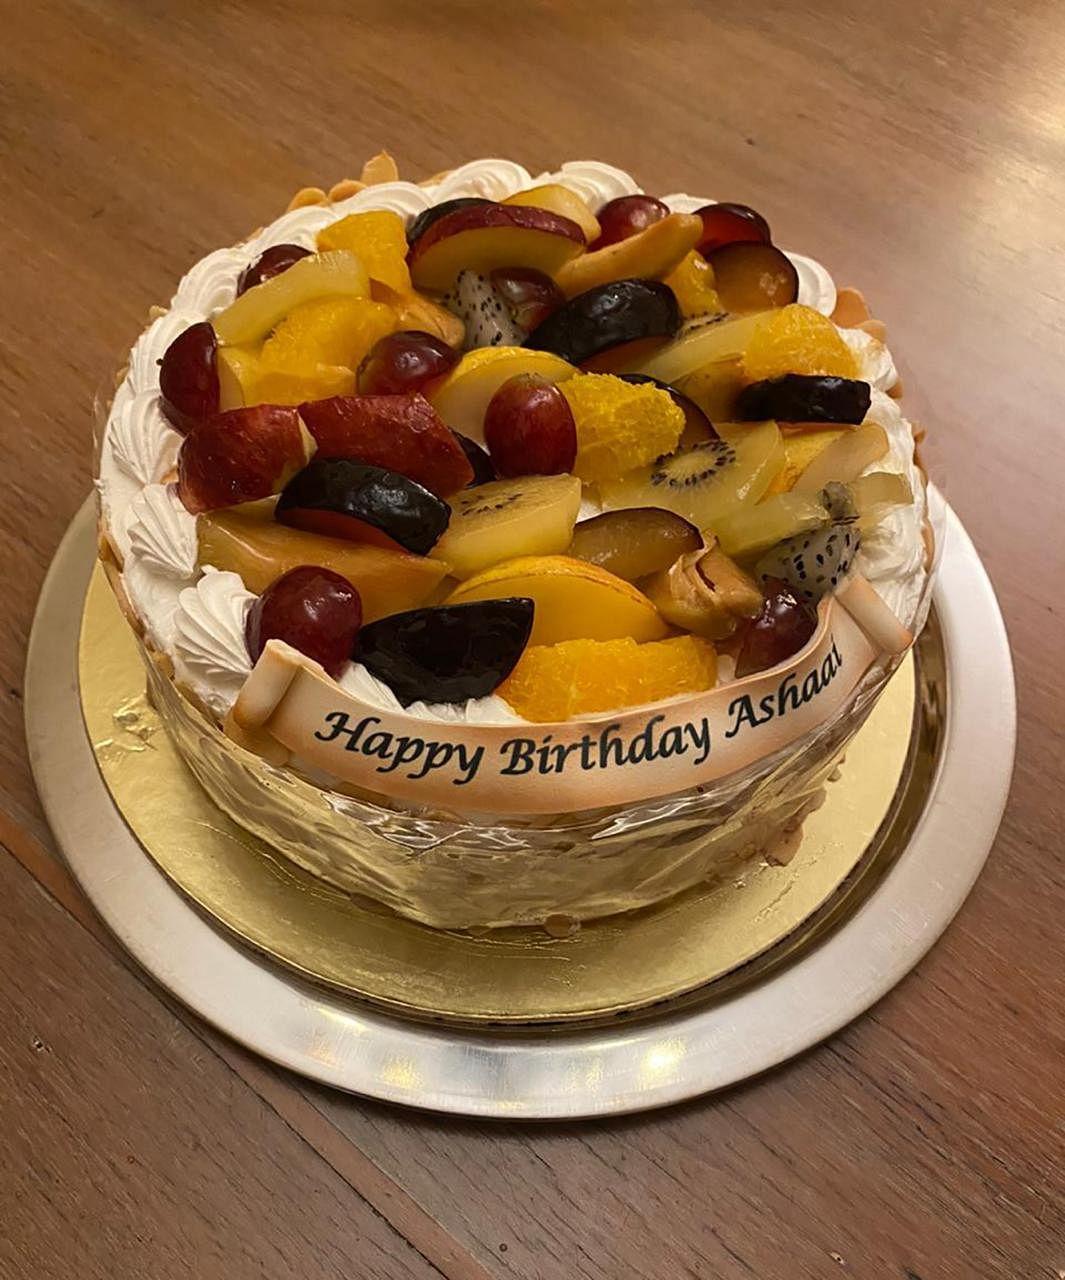 Asha Bhosle birthday cake